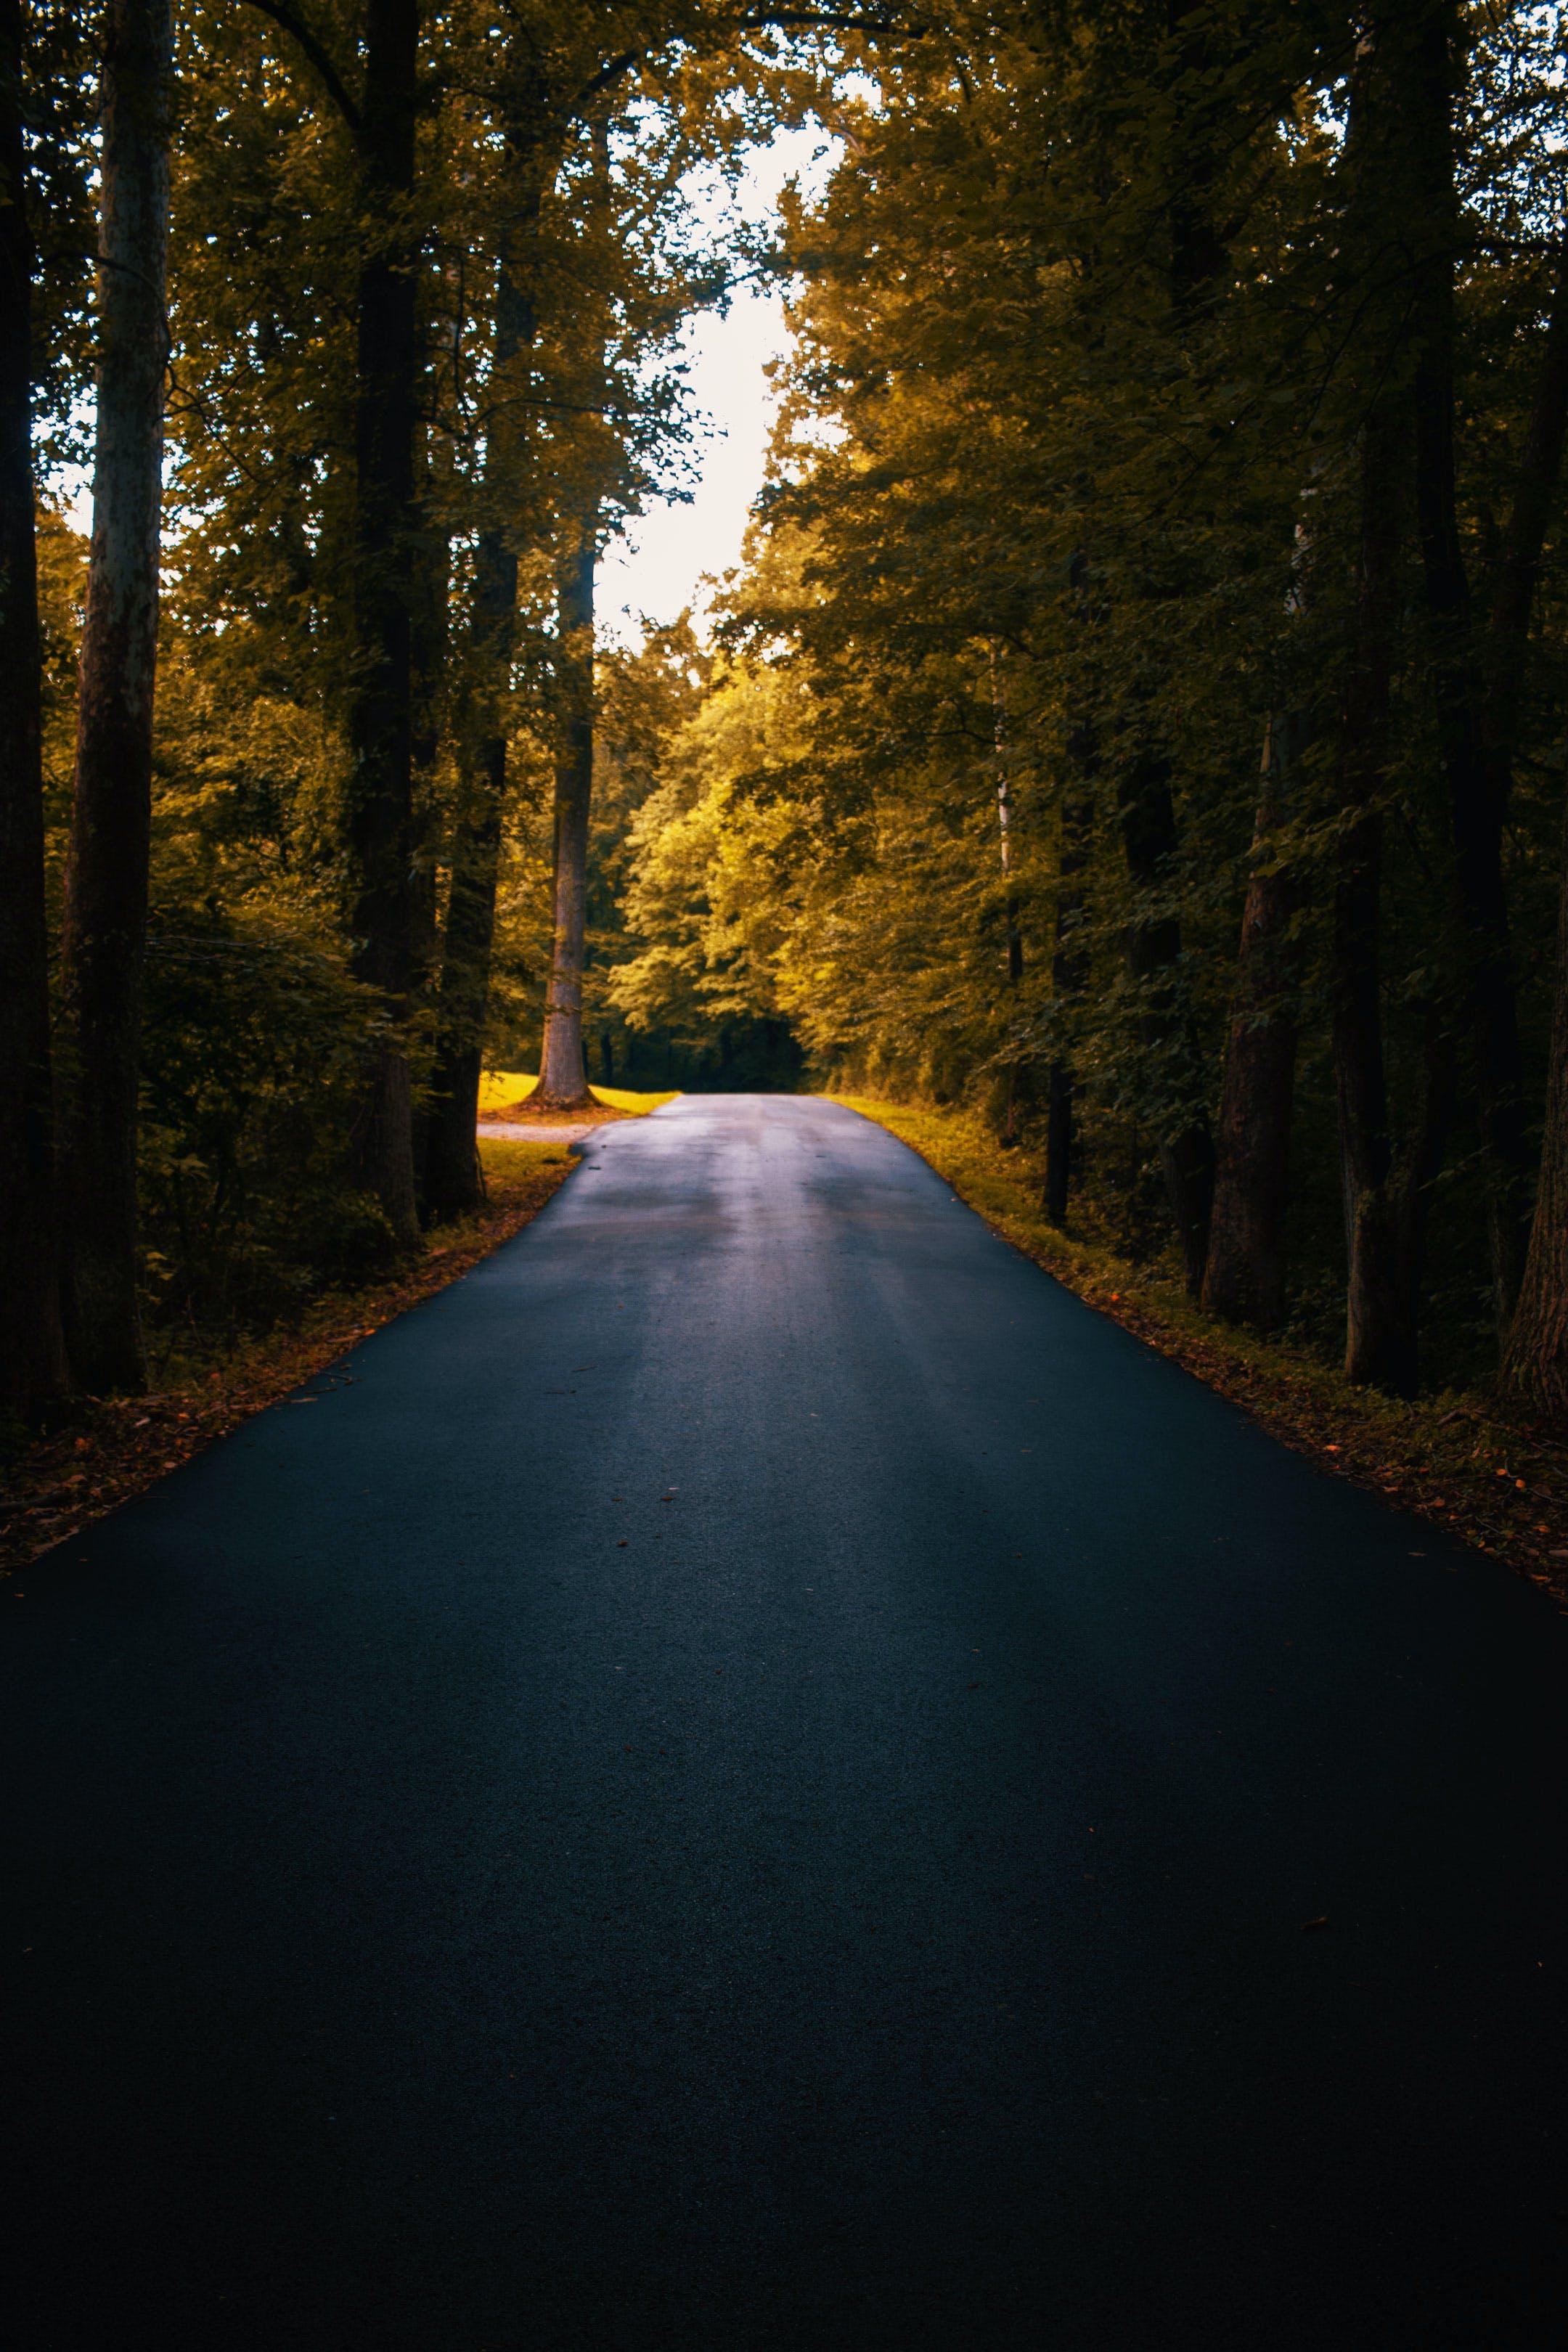 Concrete Road Between Trees